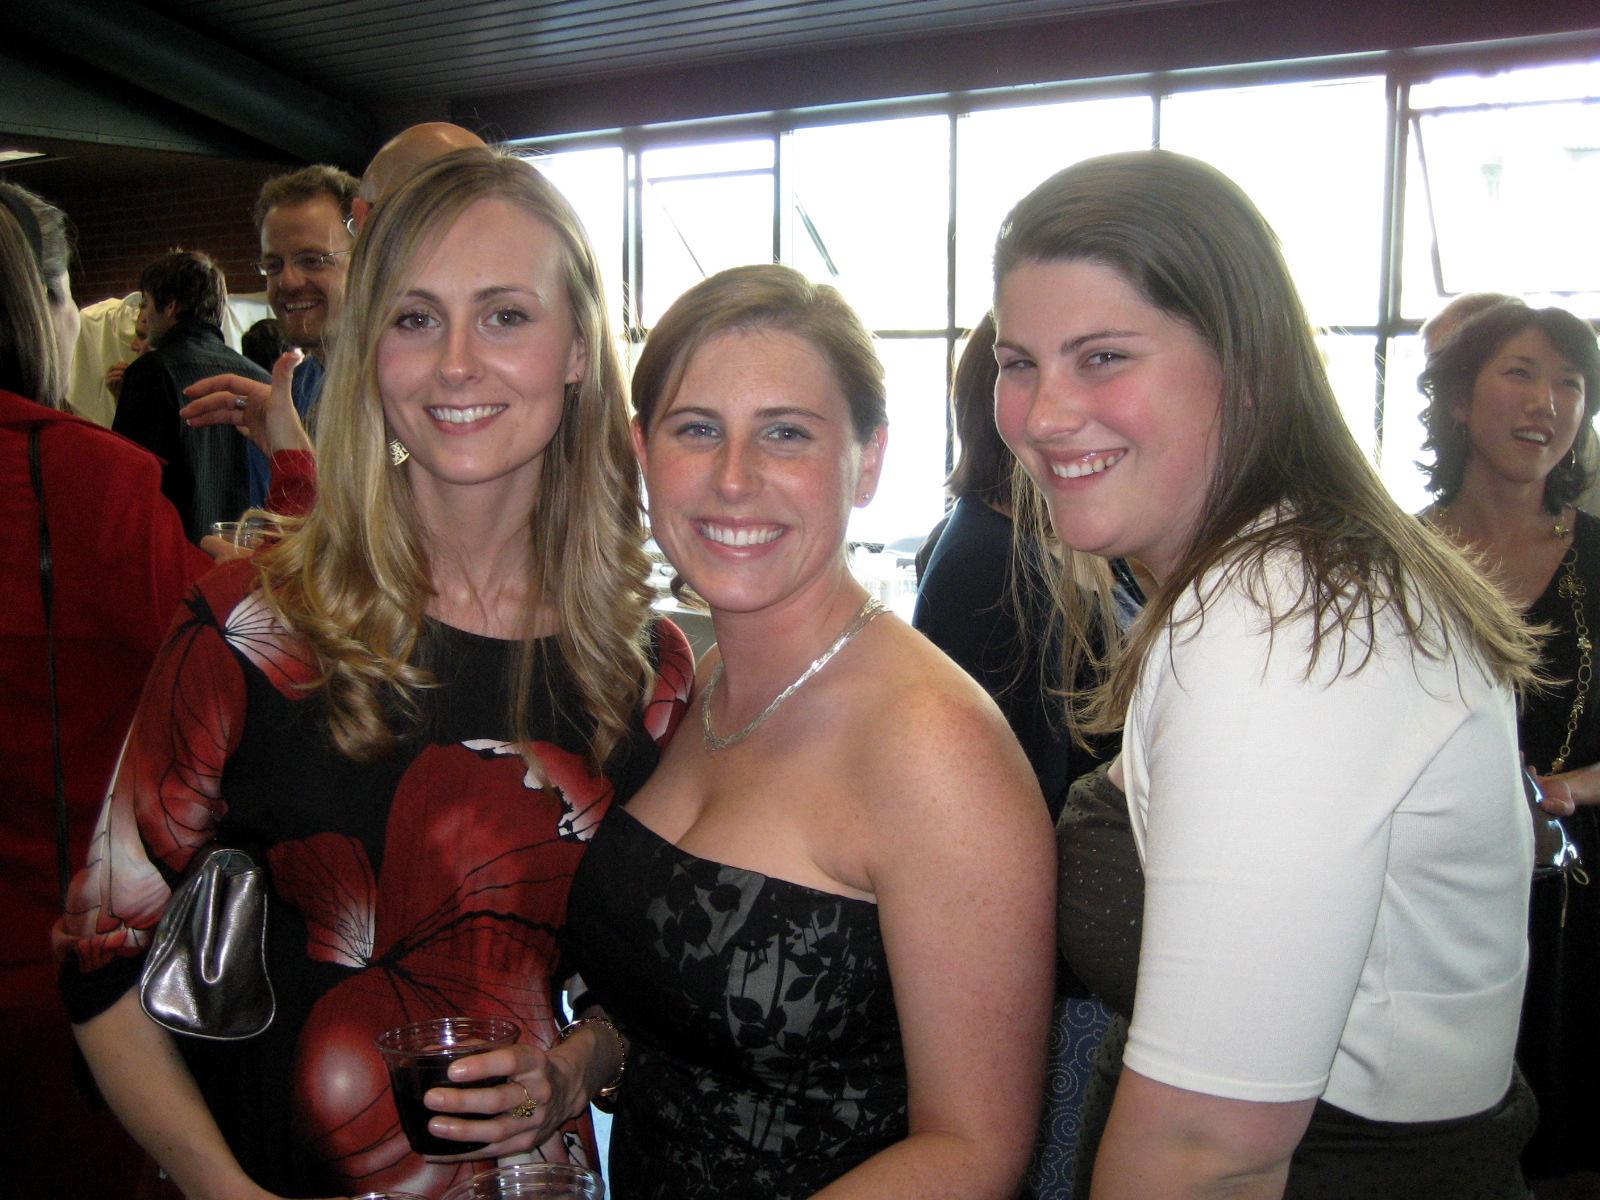 Mary, Melissa and Brooke